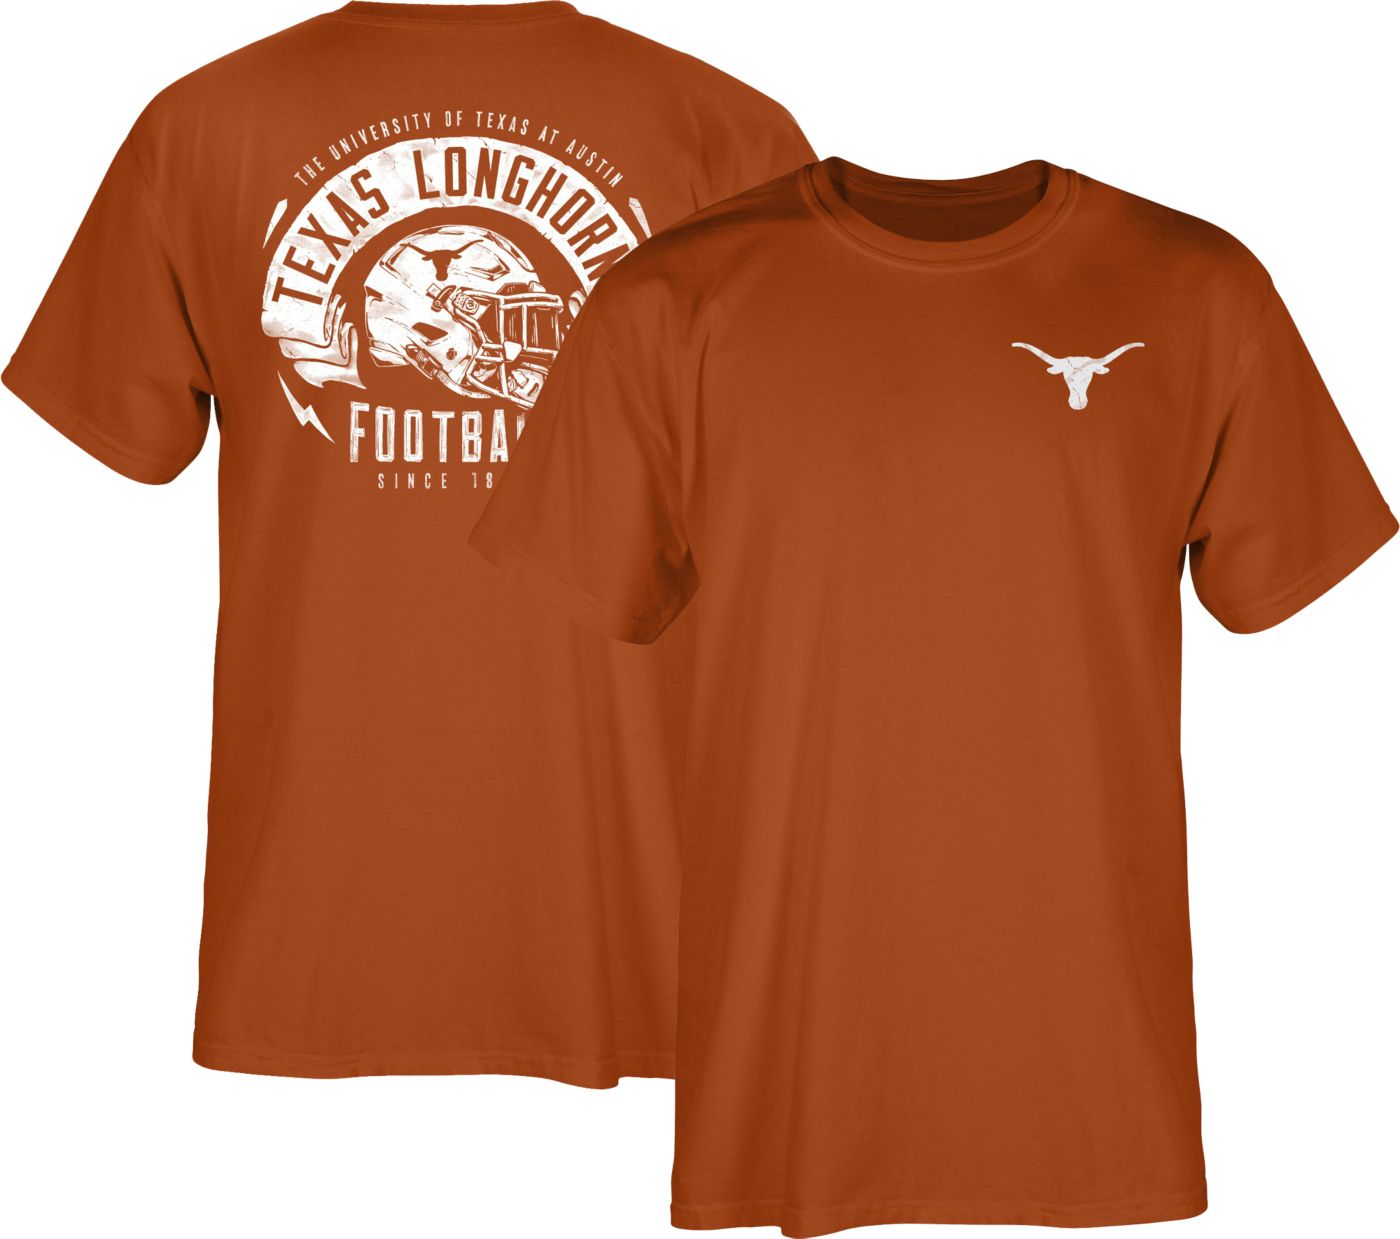 University of Texas Authentic Apparel Men's Texas Longhorns Burnt Orange Bundy Helmet T-Shirt